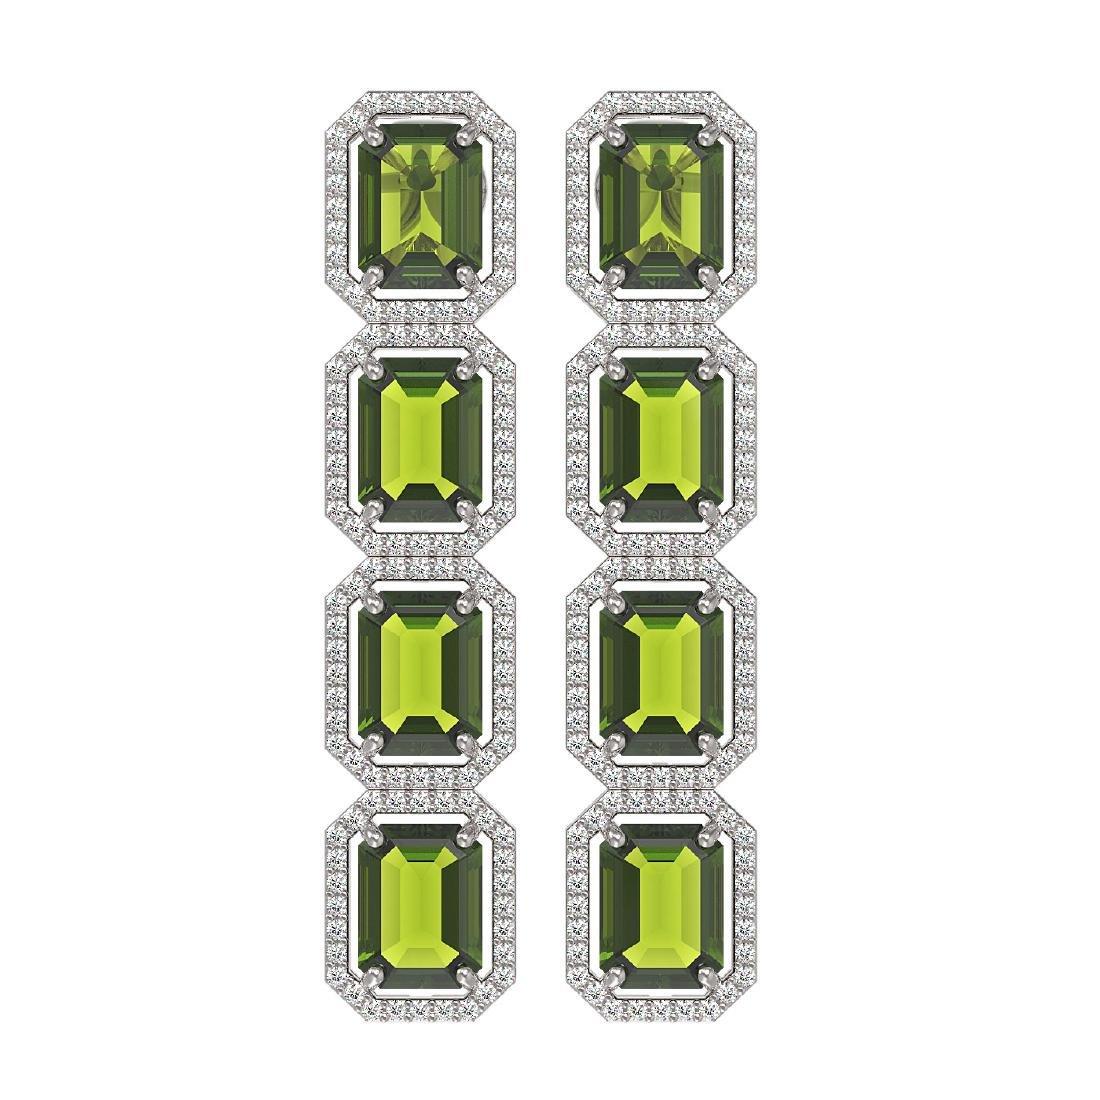 19.44 CTW Tourmaline & Diamond Halo Earrings 10K White